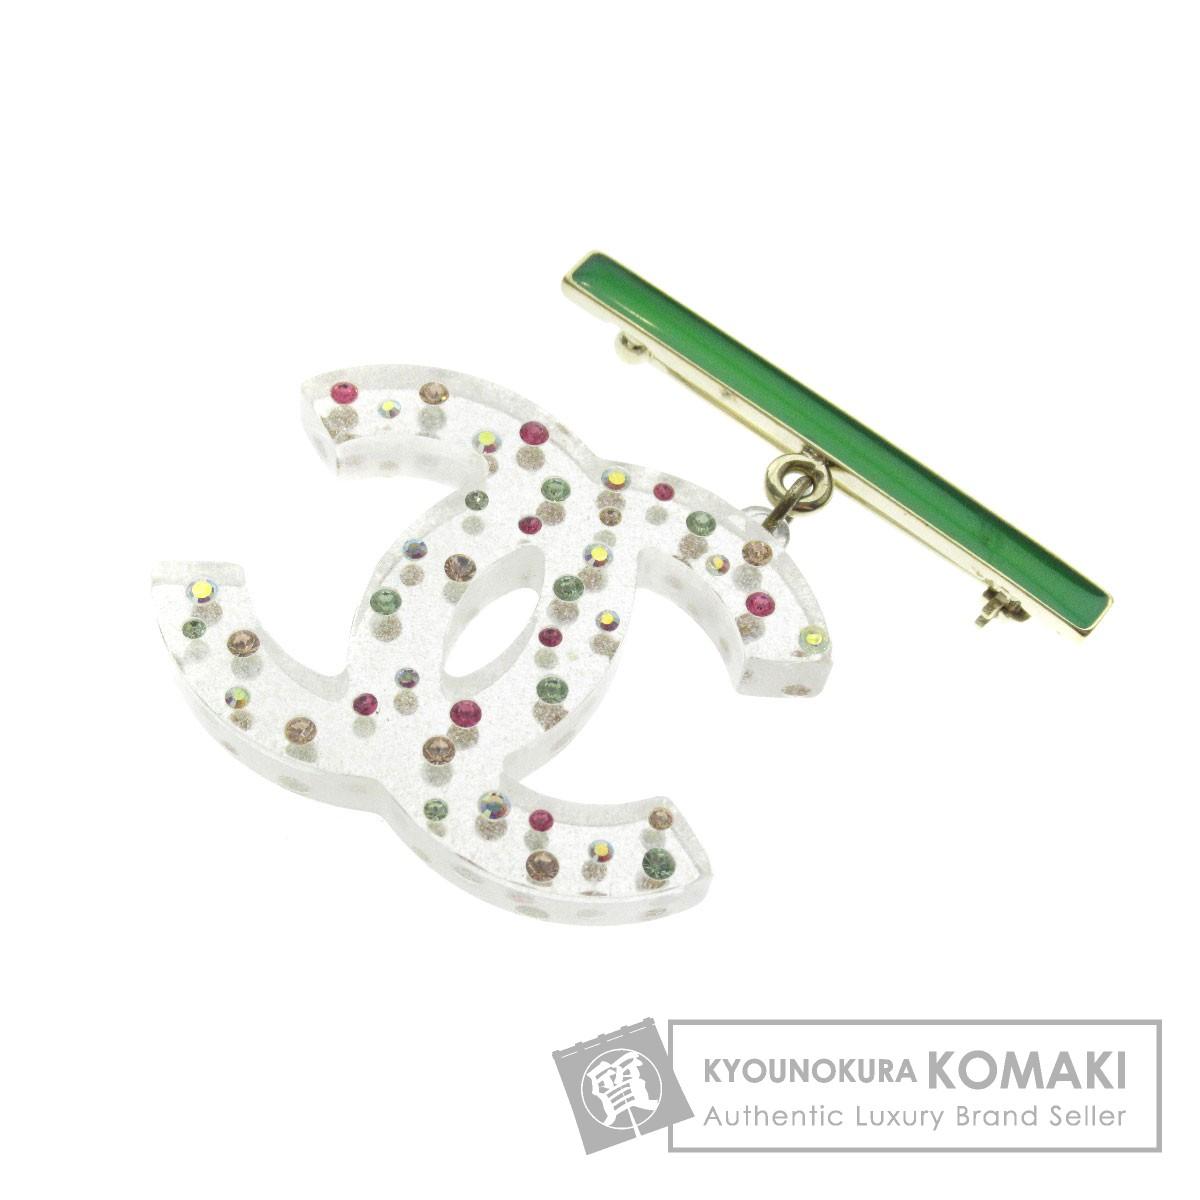 CHANEL ココマーク ラインストーン ブローチ プラスチック レディース 【中古】【シャネル】